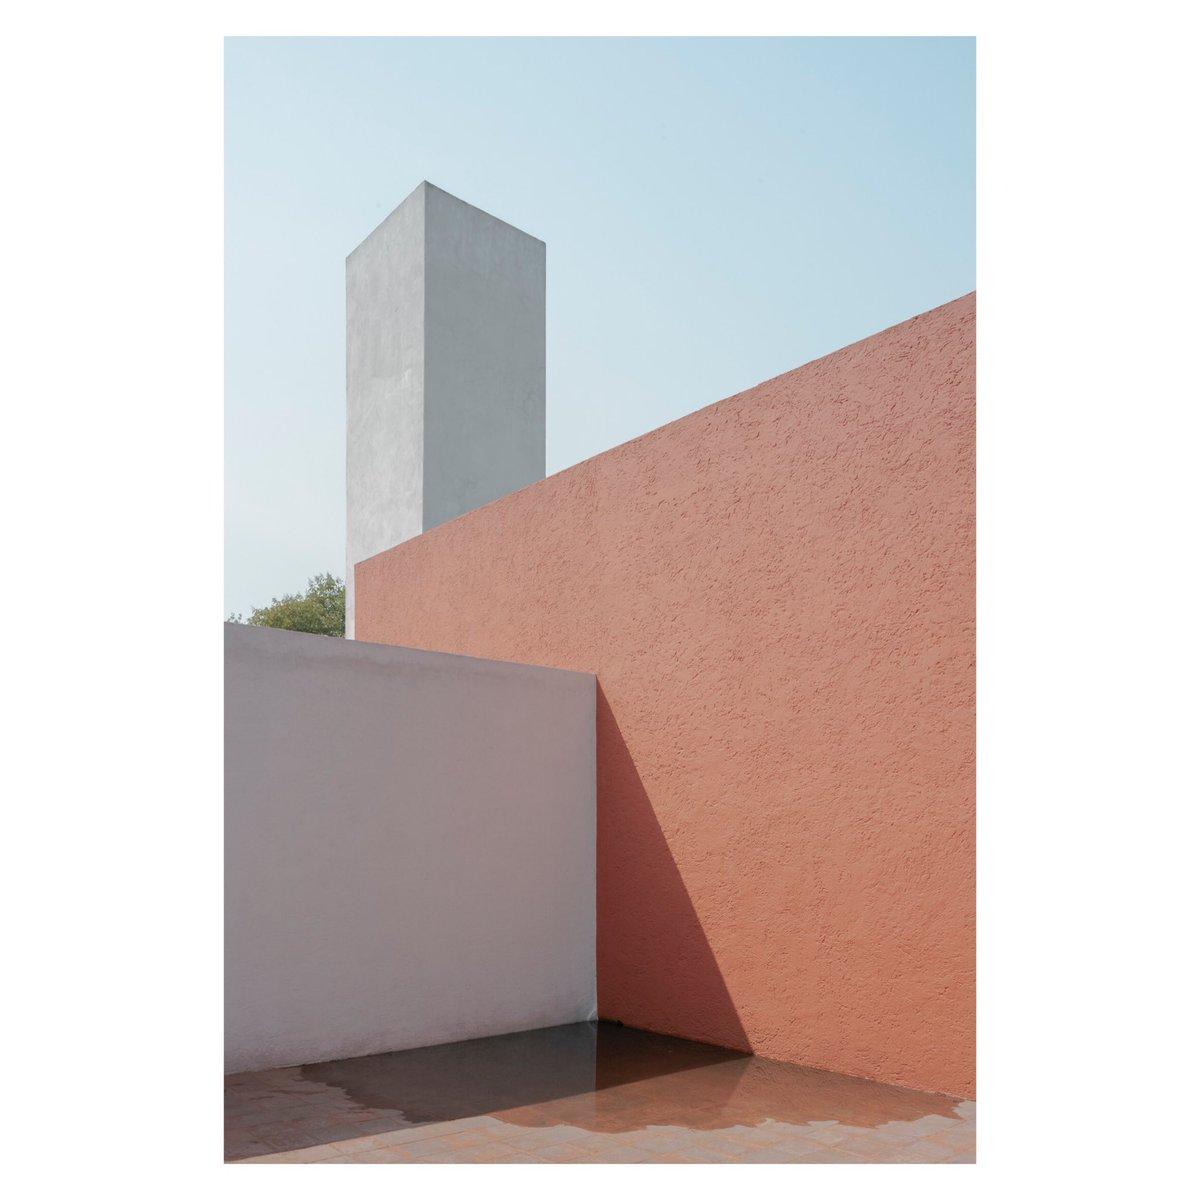 """#Stayhome and let the light come in.""   Casa Estudio Luis Barragàn | 1948 | Mexico City, MX  #LuisBarragàn #CasaEstudioLuisBarragàn #MexicanArchitecture pic.twitter.com/tk2yXPbFcC"